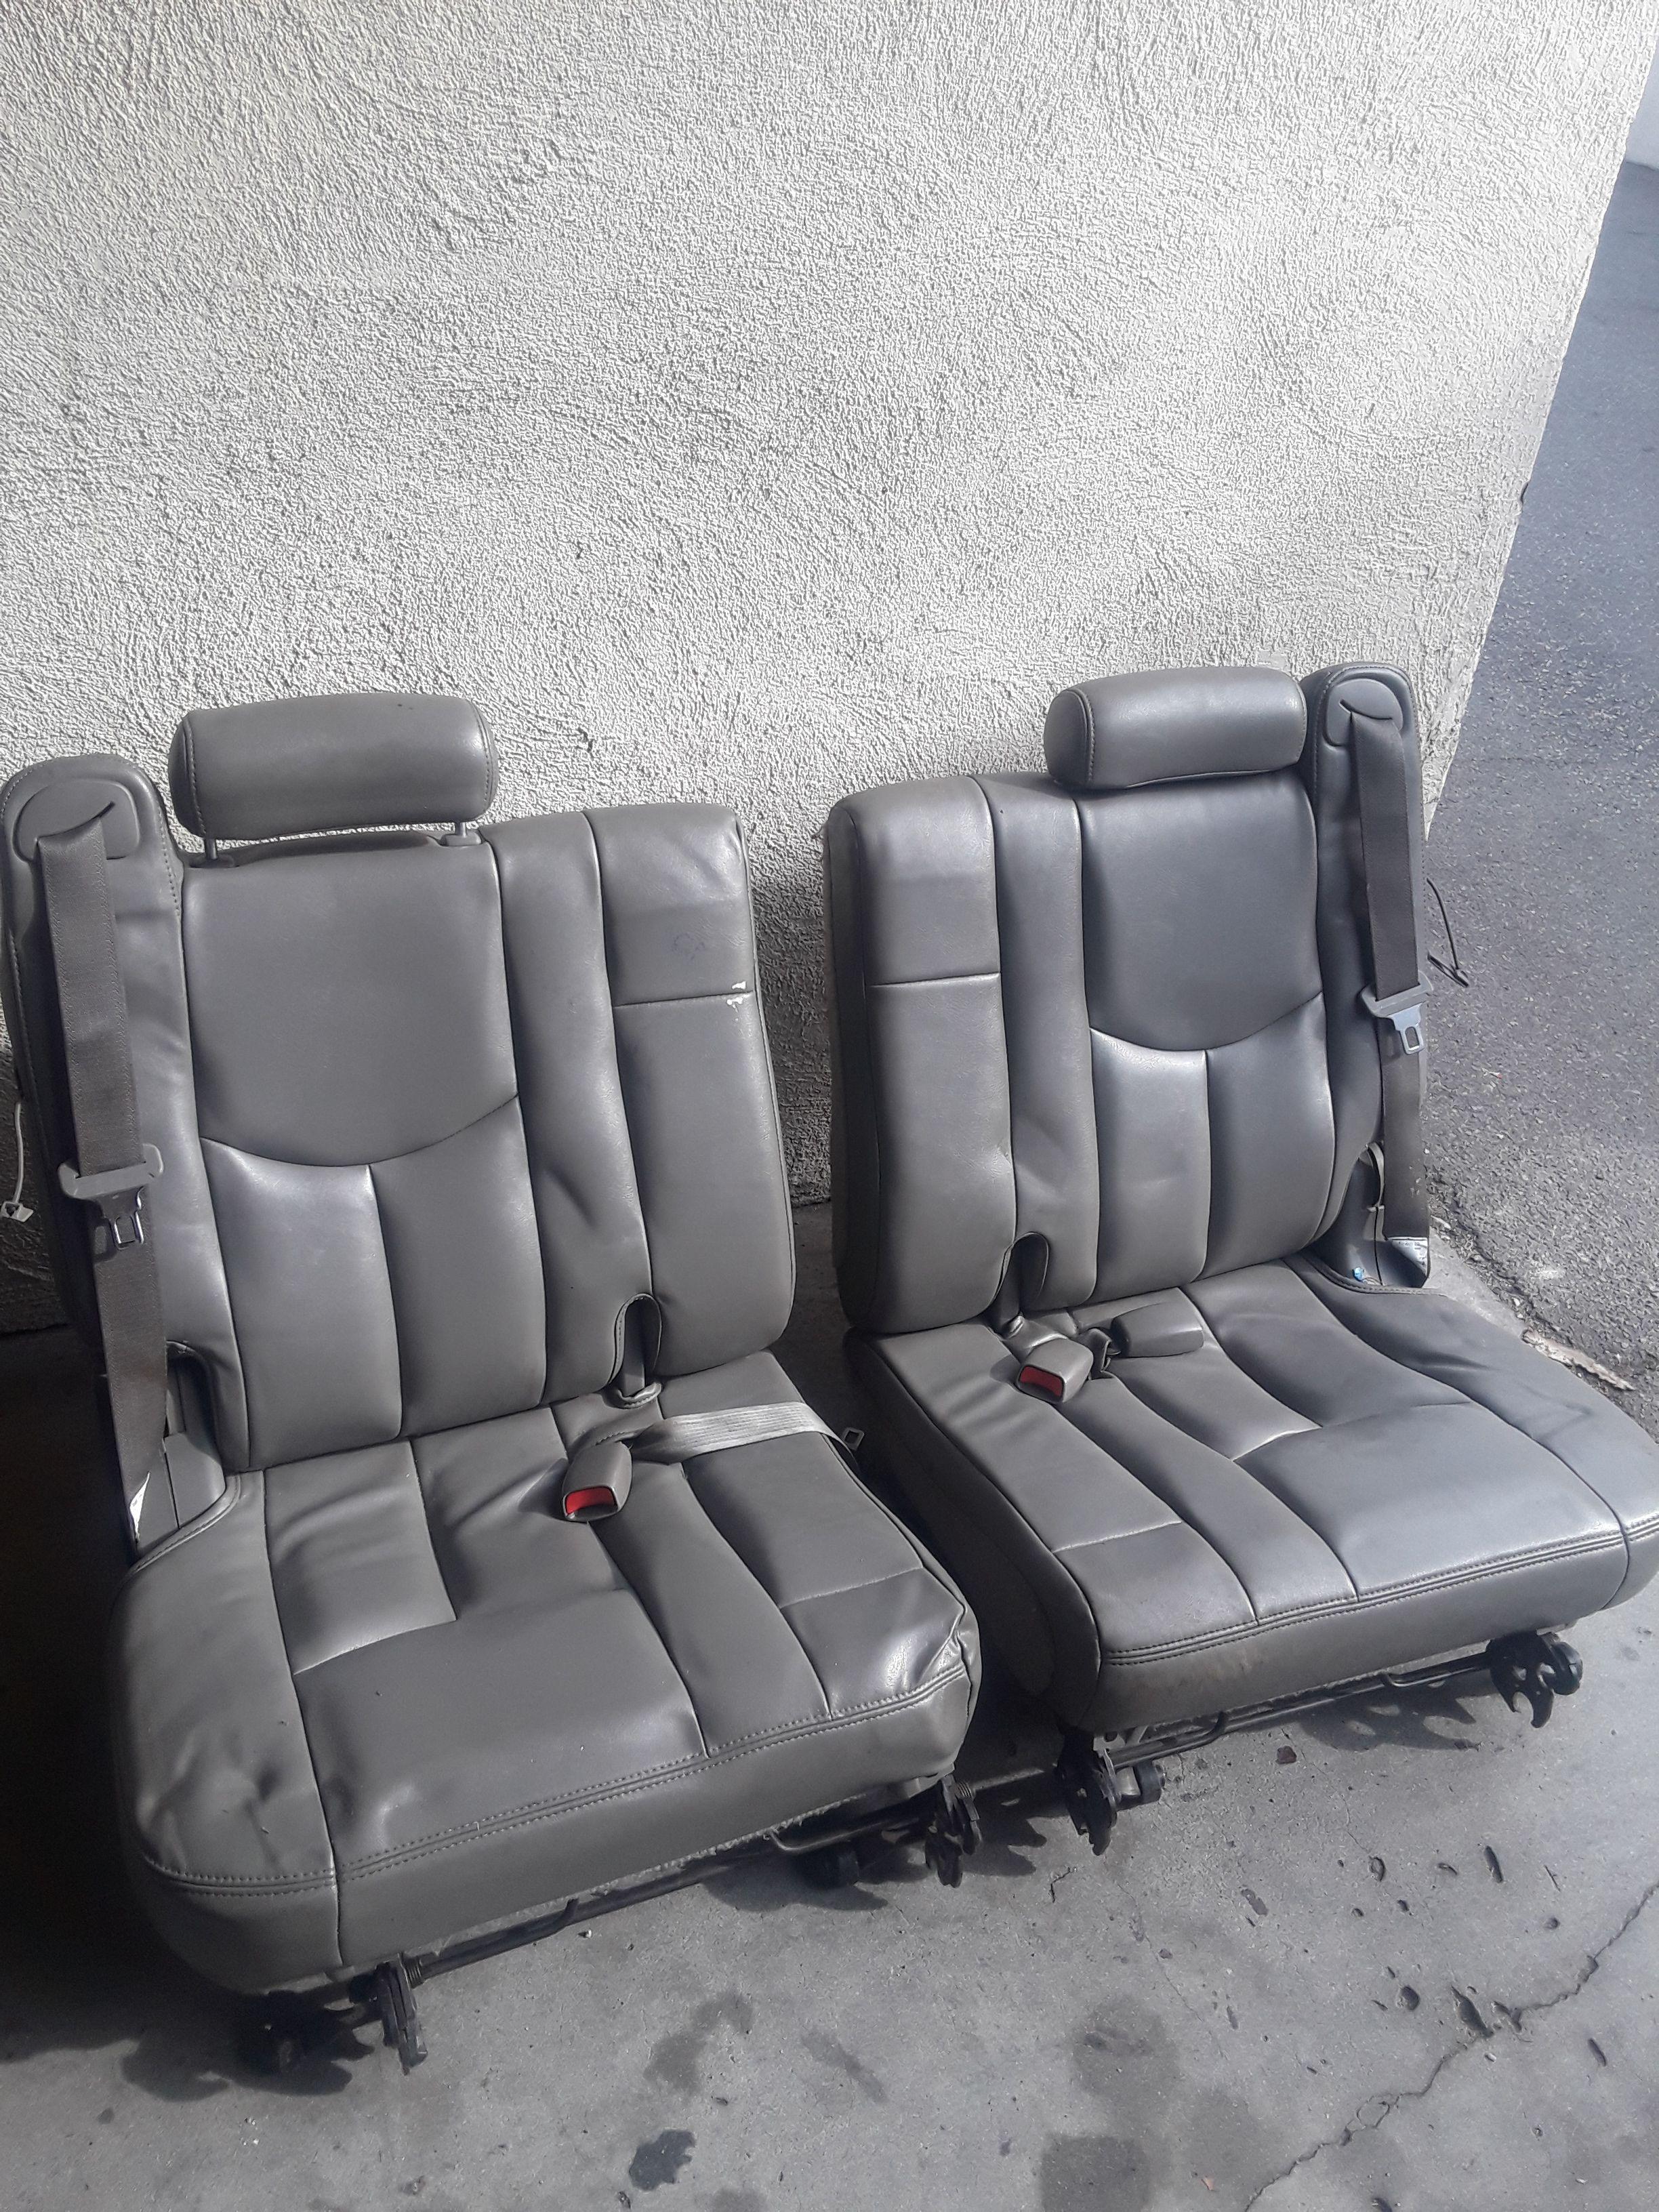 3 row GMC Leather seats like new no rips